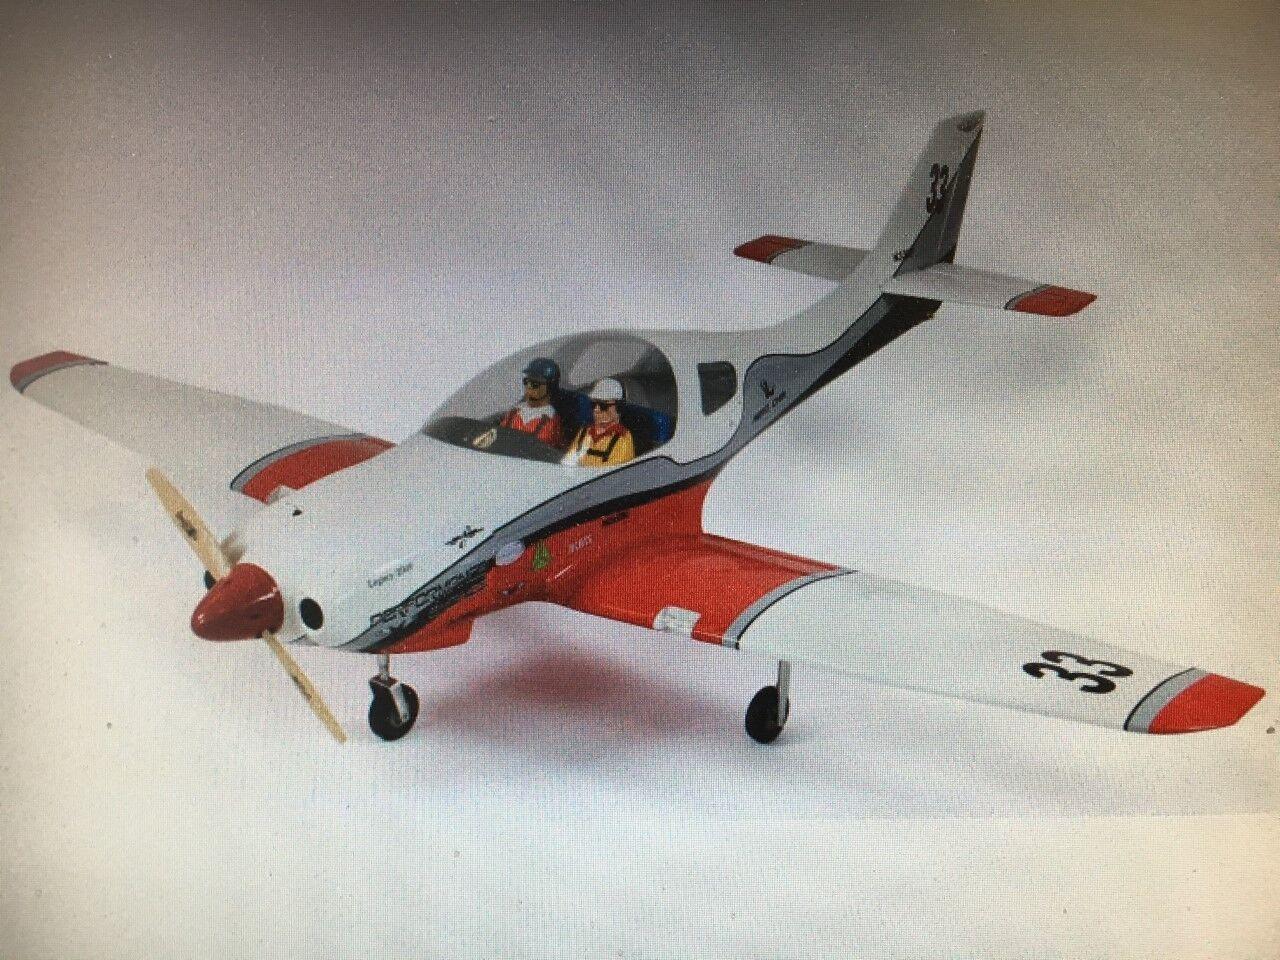 Lancair Legacy (91) (SEA-160)Span - 70.9ins (180cm) ,.99 SRP , UK Model shop